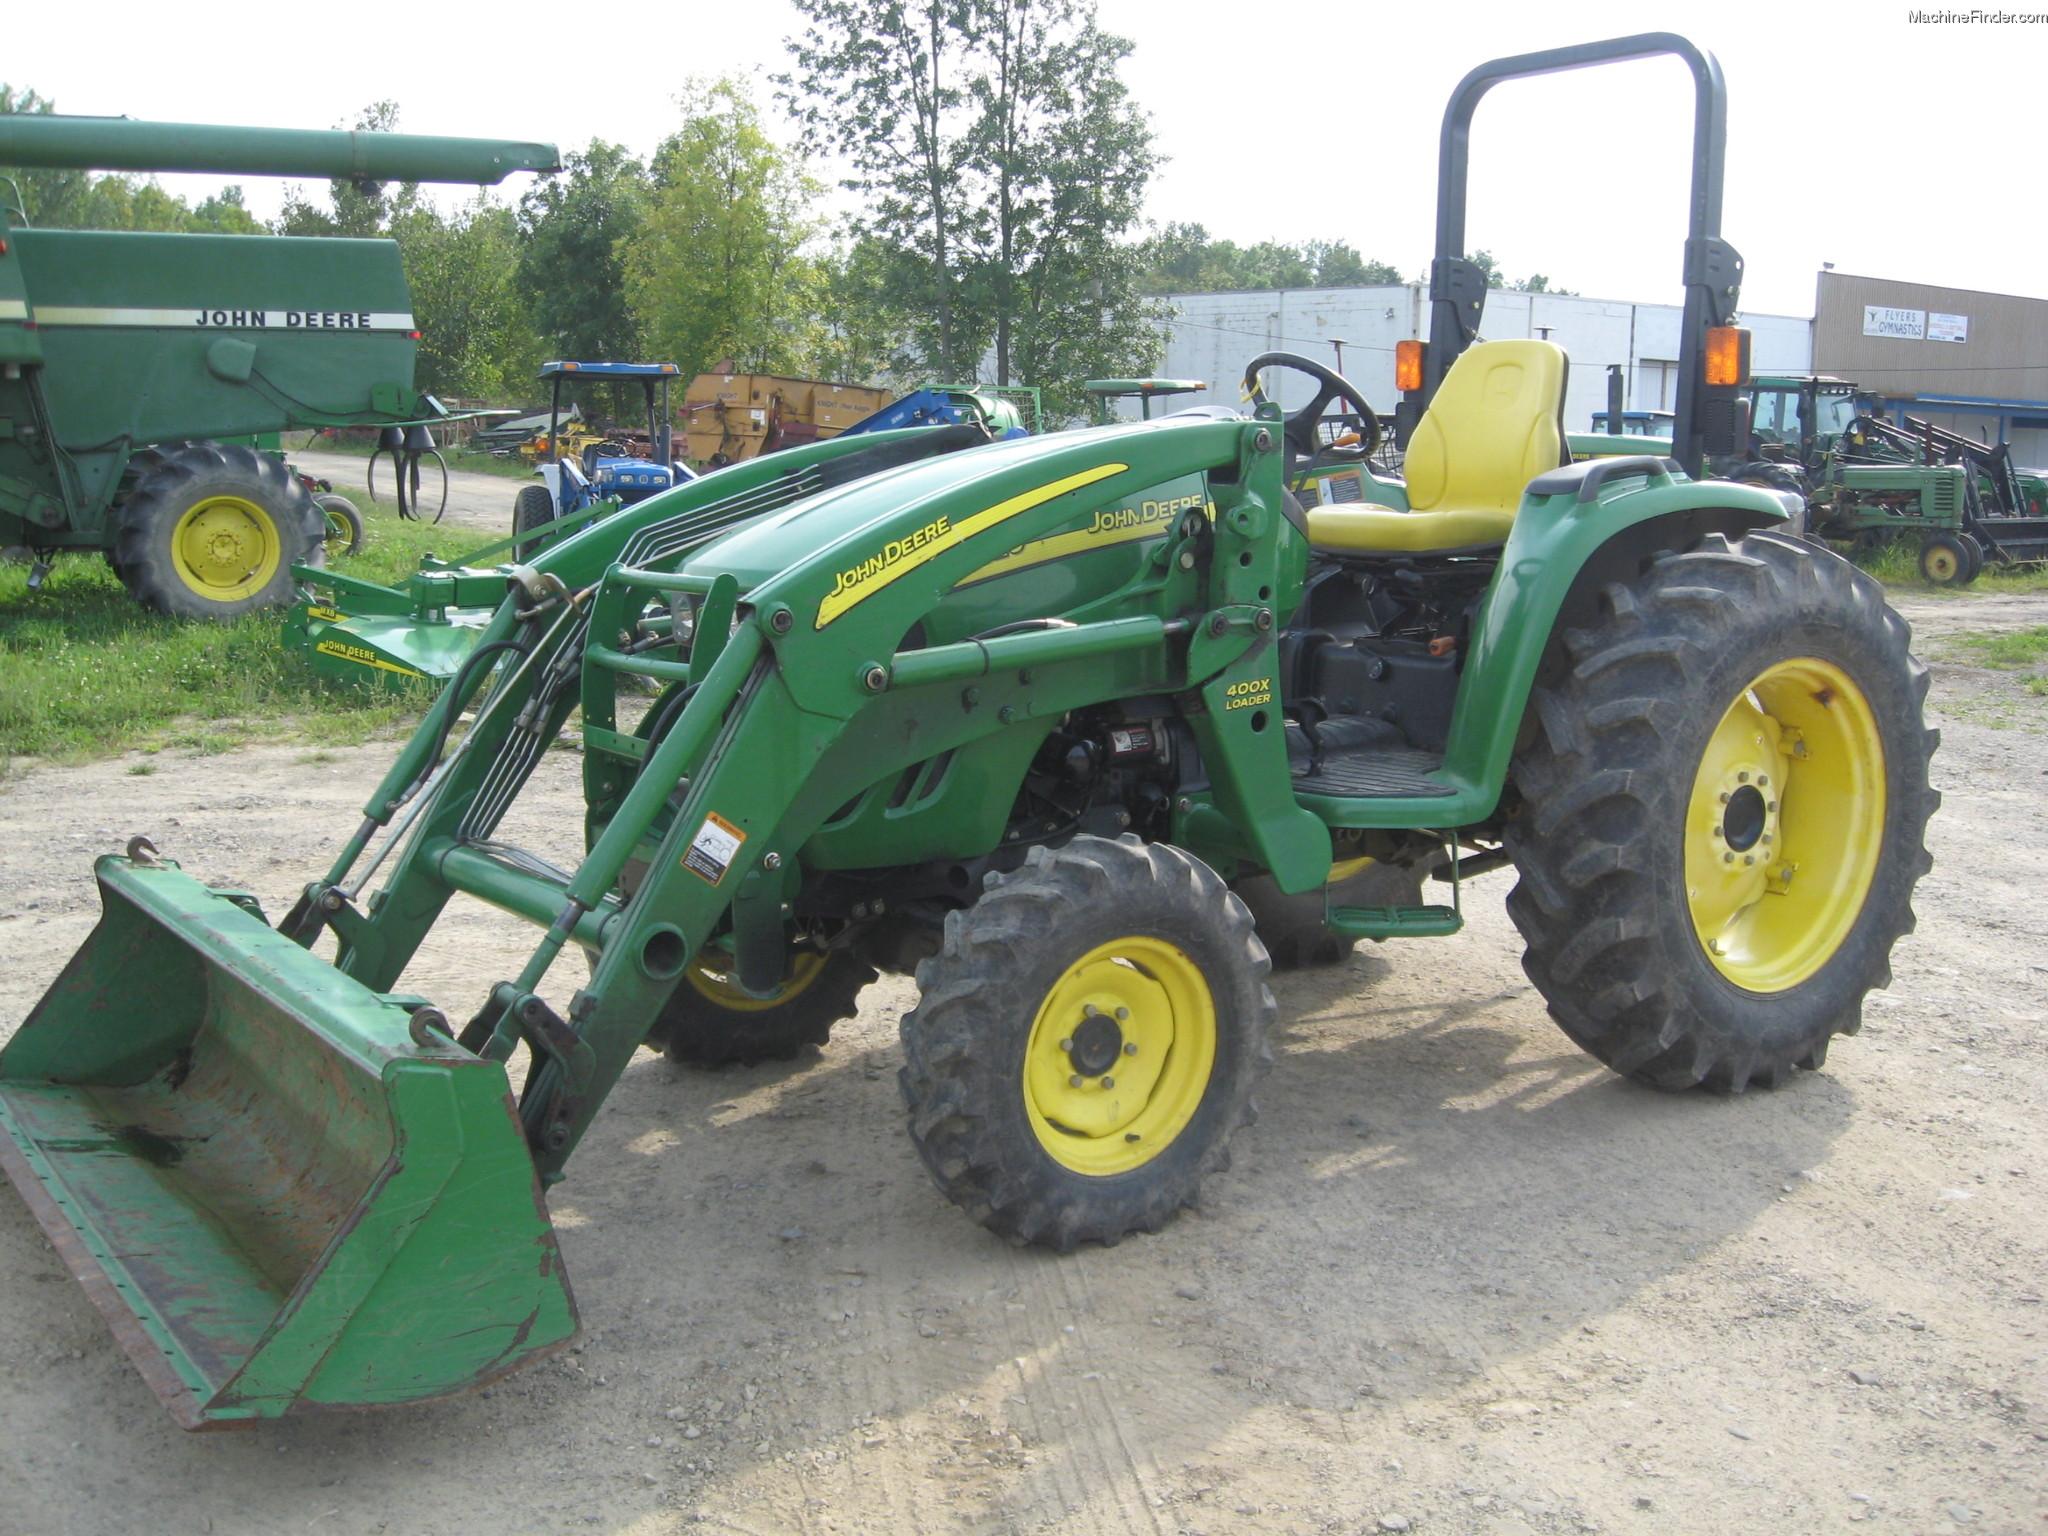 2007 John Deere 4320 Tractors - Utility (40-100hp) - John ...